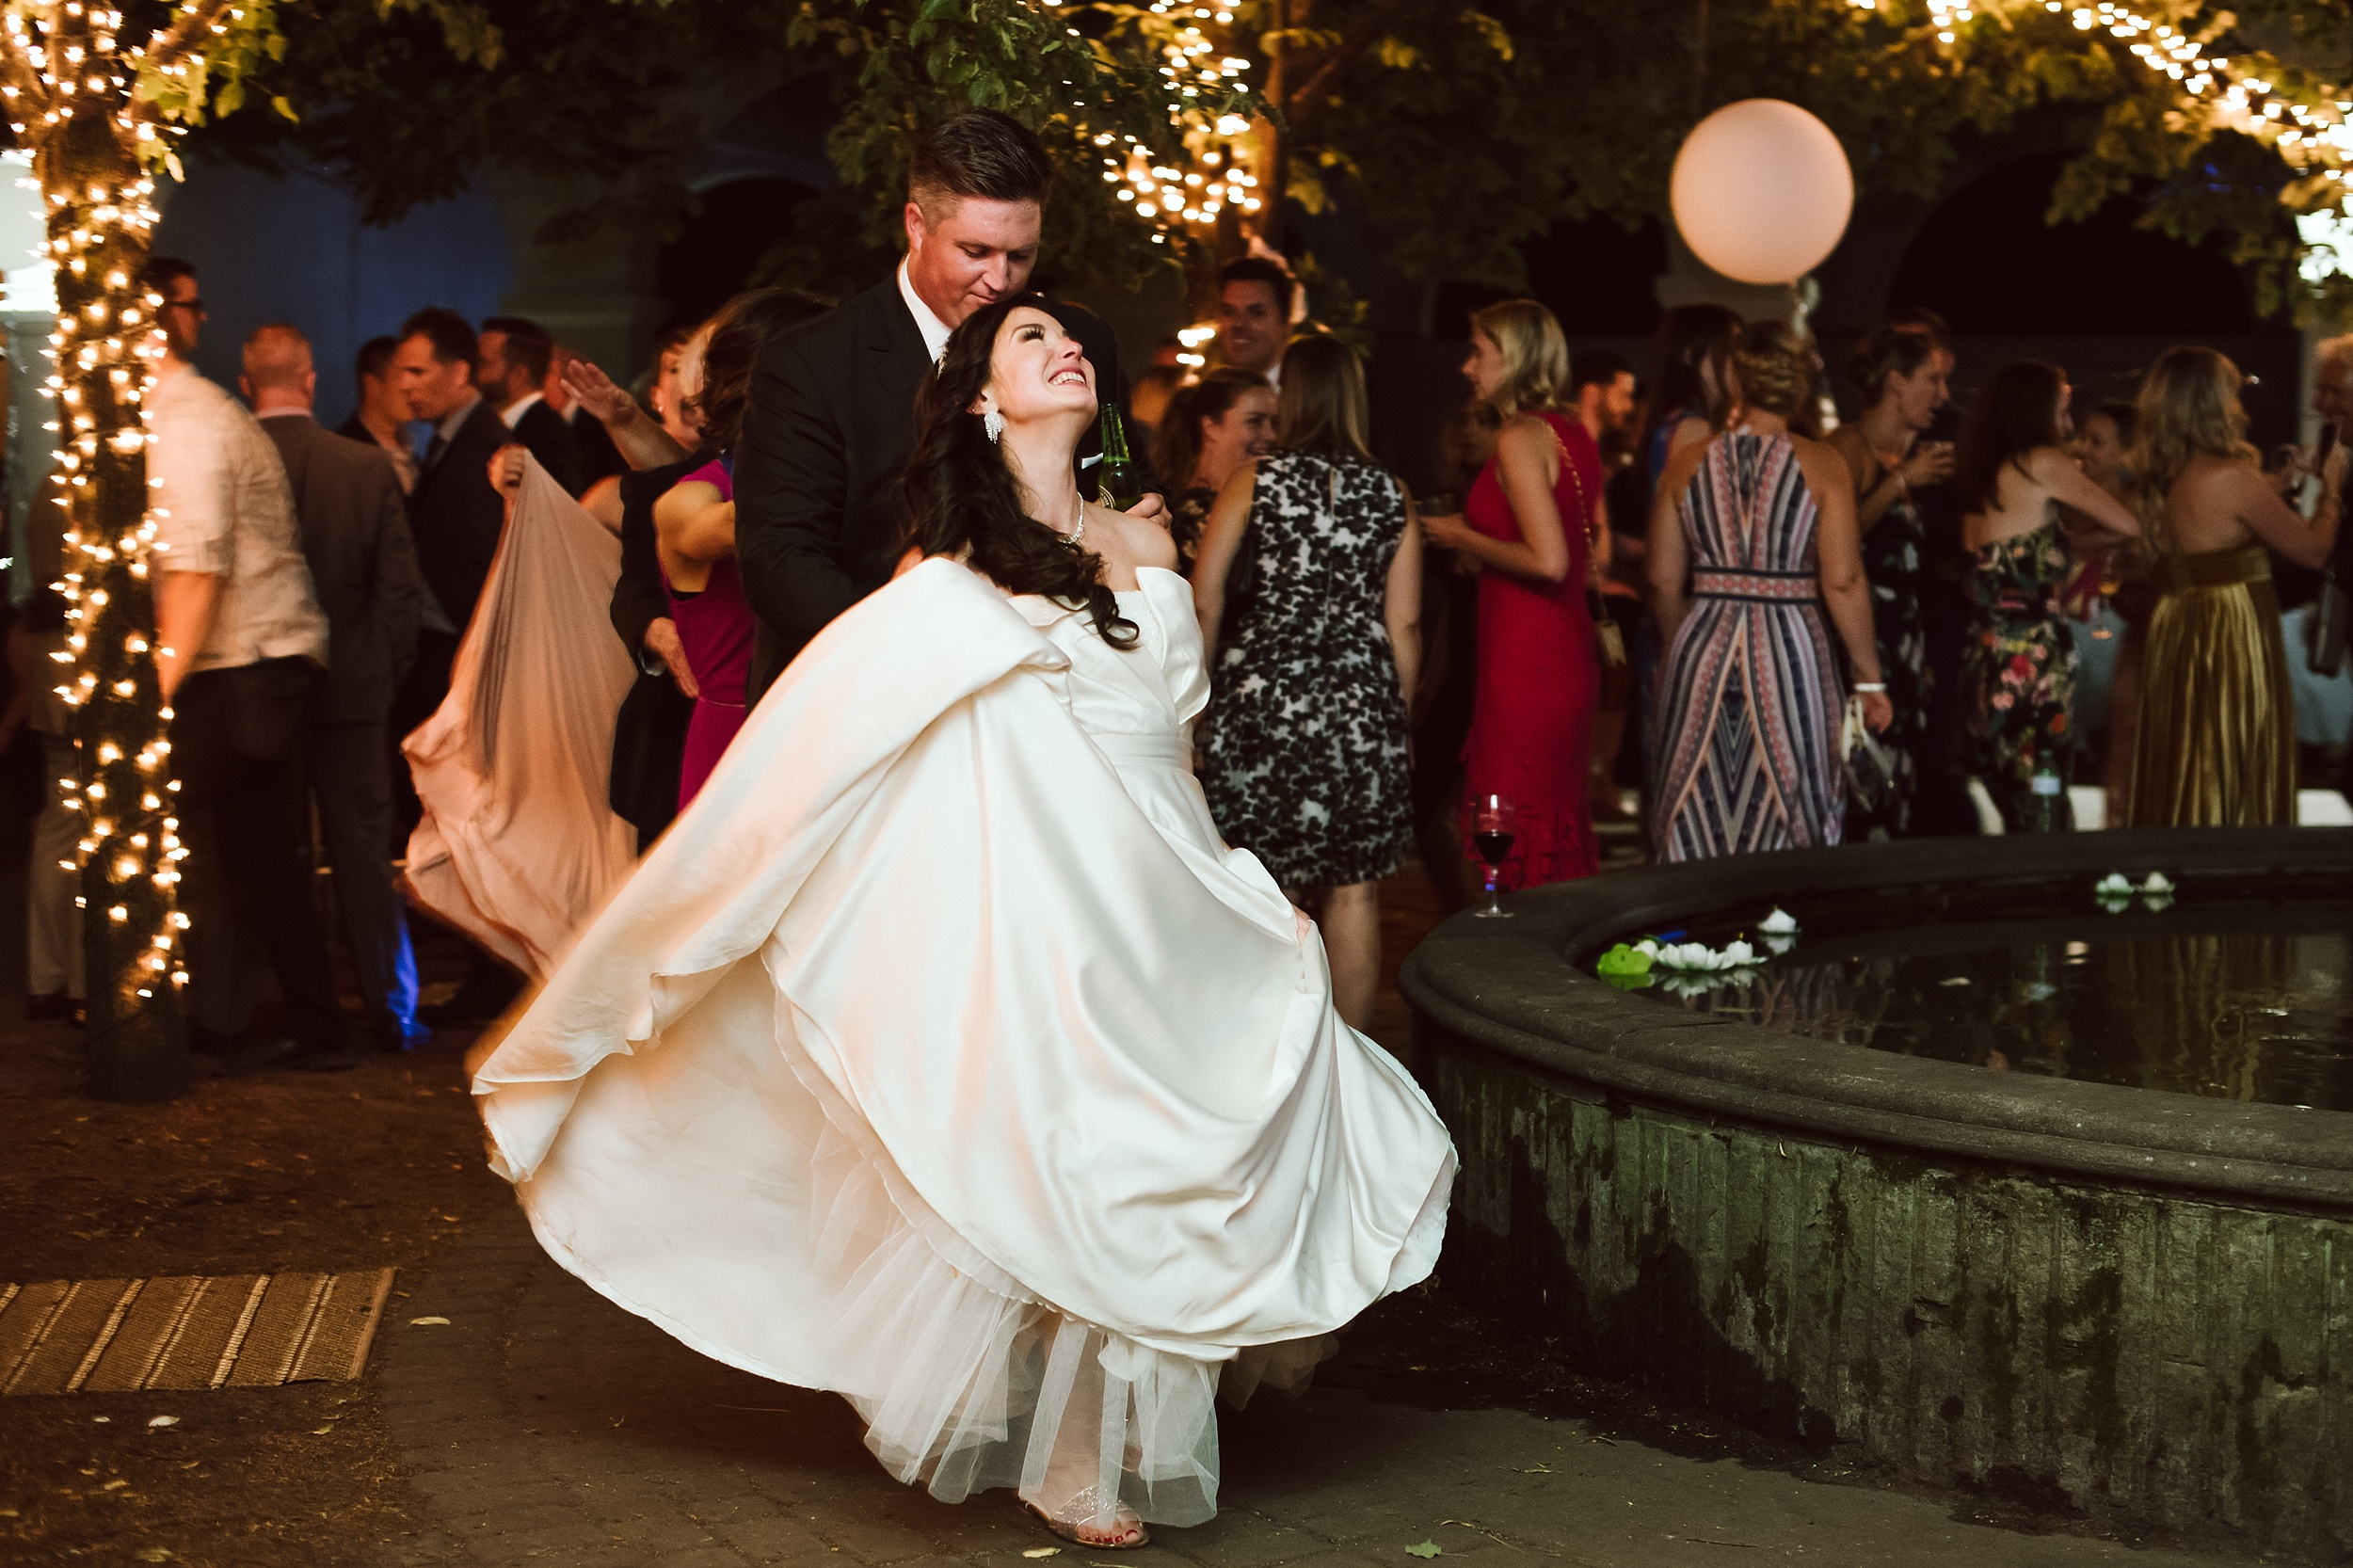 Sunnyside_Pavilion_Wedding_Toronto_Photographer_0123.jpg